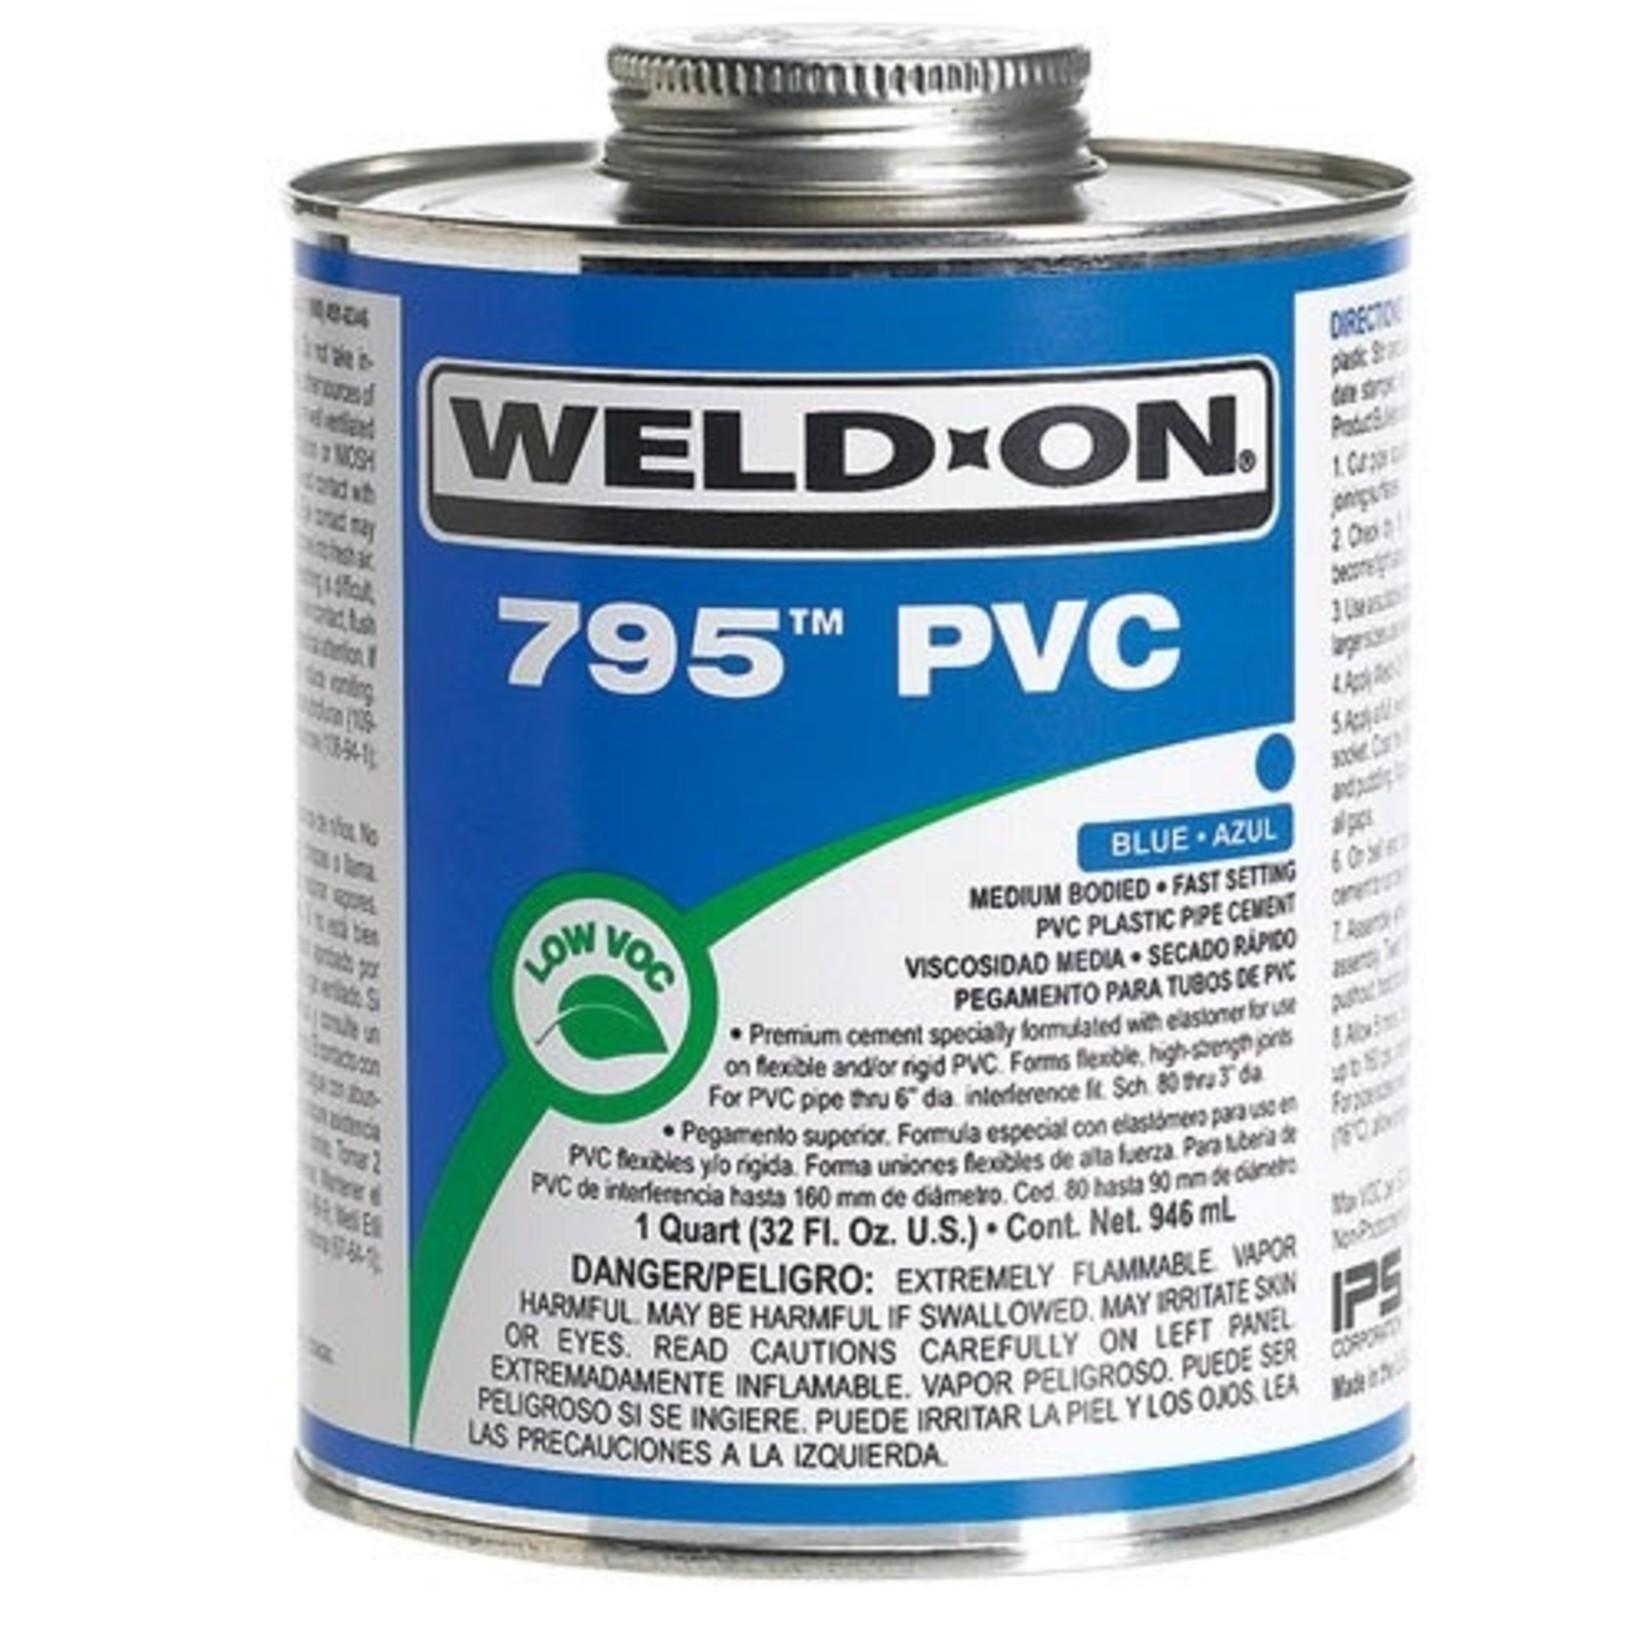 795 PVC CEMENT-CLEAR 1/4 PINT